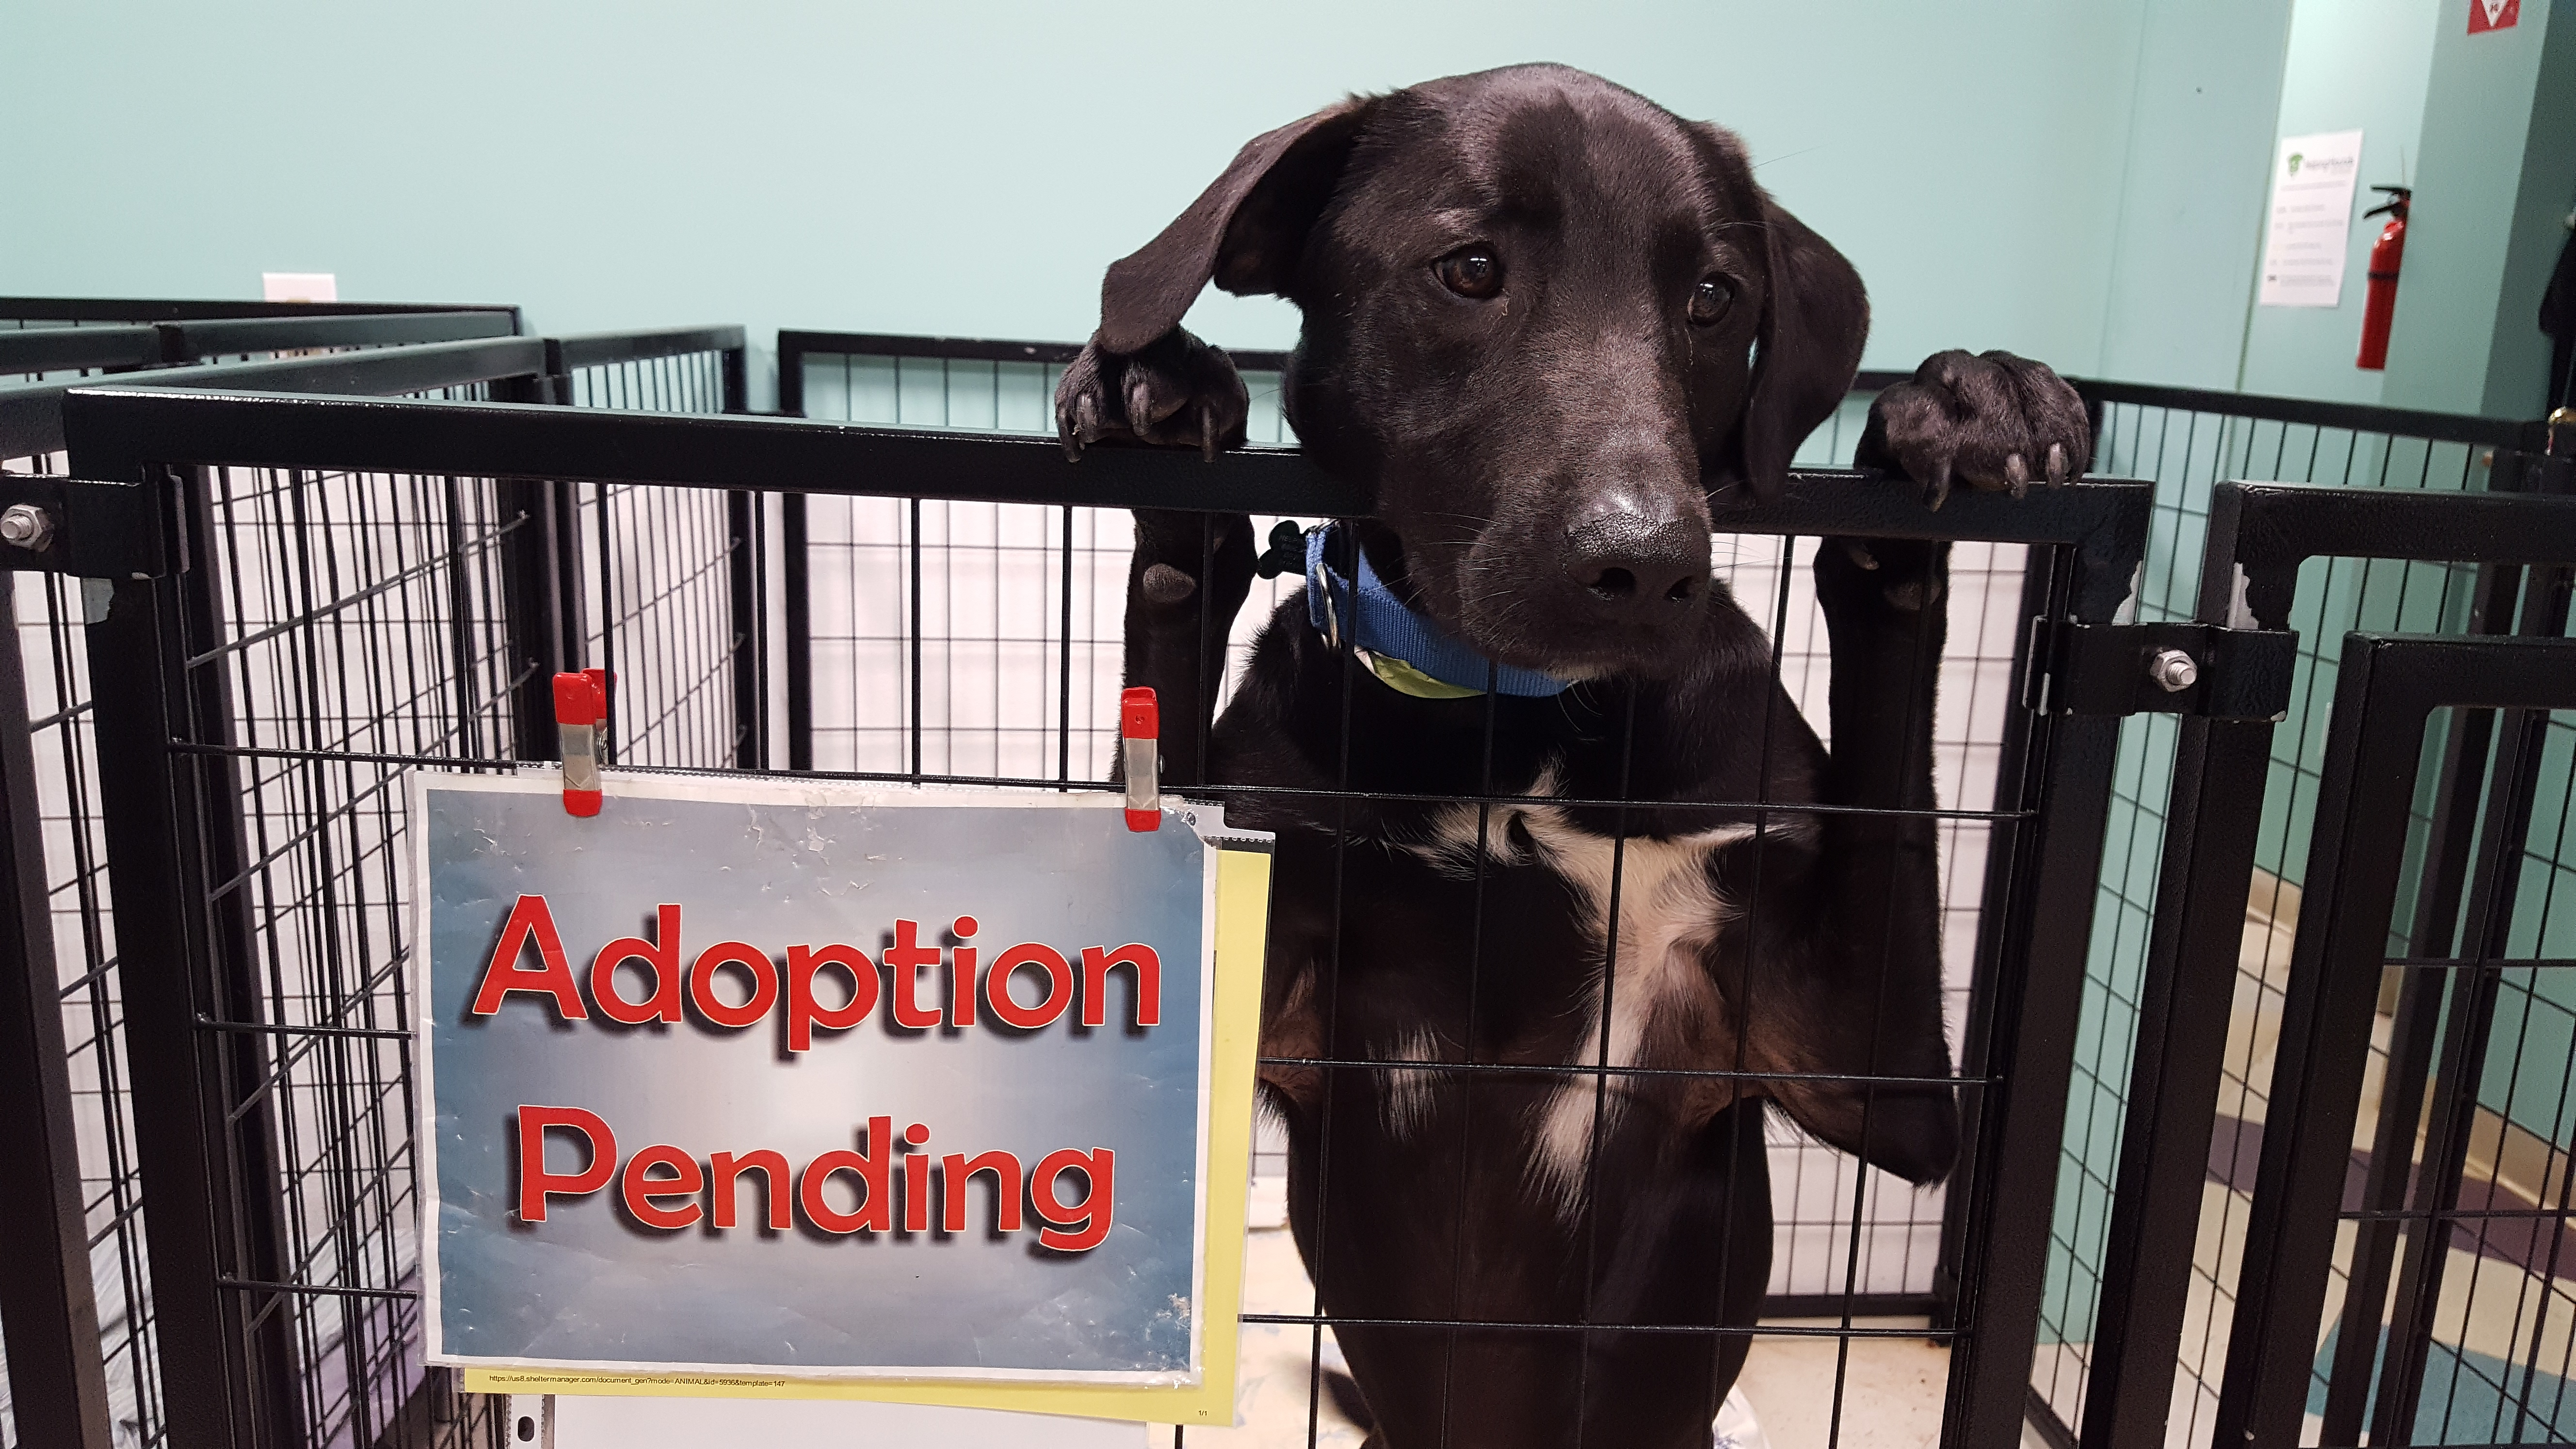 adoptionpending.jpg